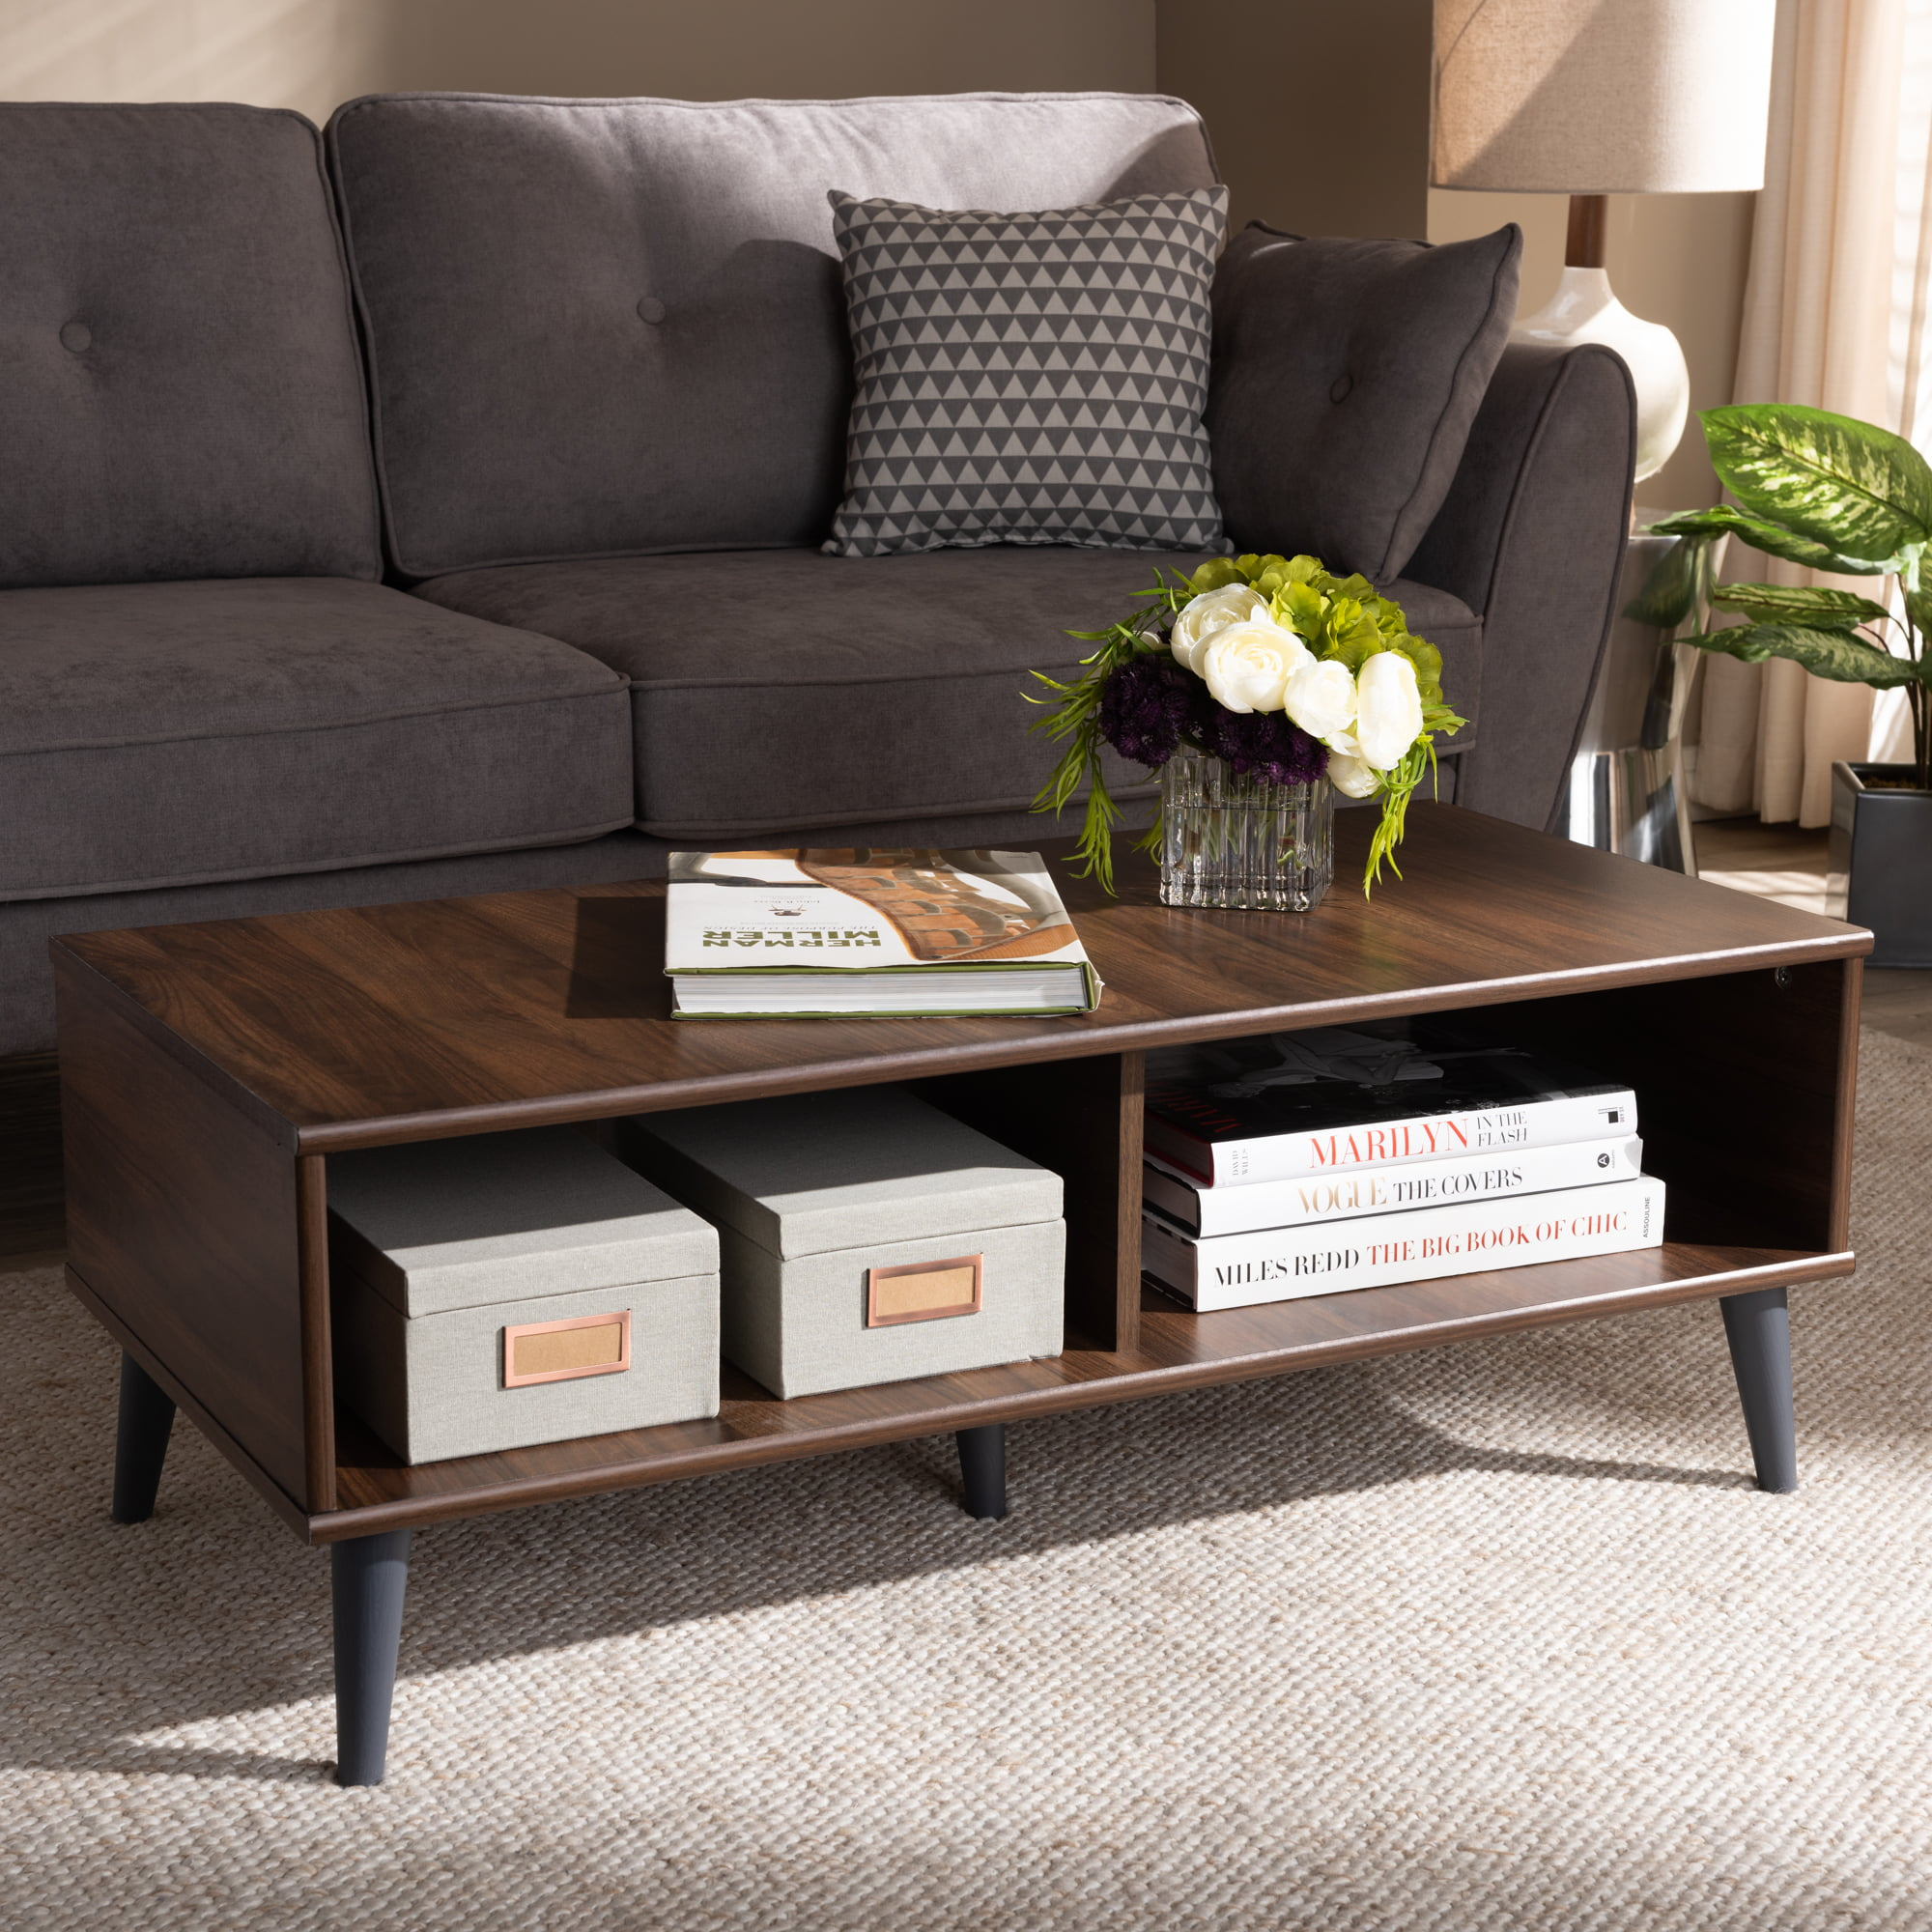 Baxton Studio Pierre Mid Century Modern Brown And Dark Grey Finished Wood Coffee Table Walmart Com Walmart Com